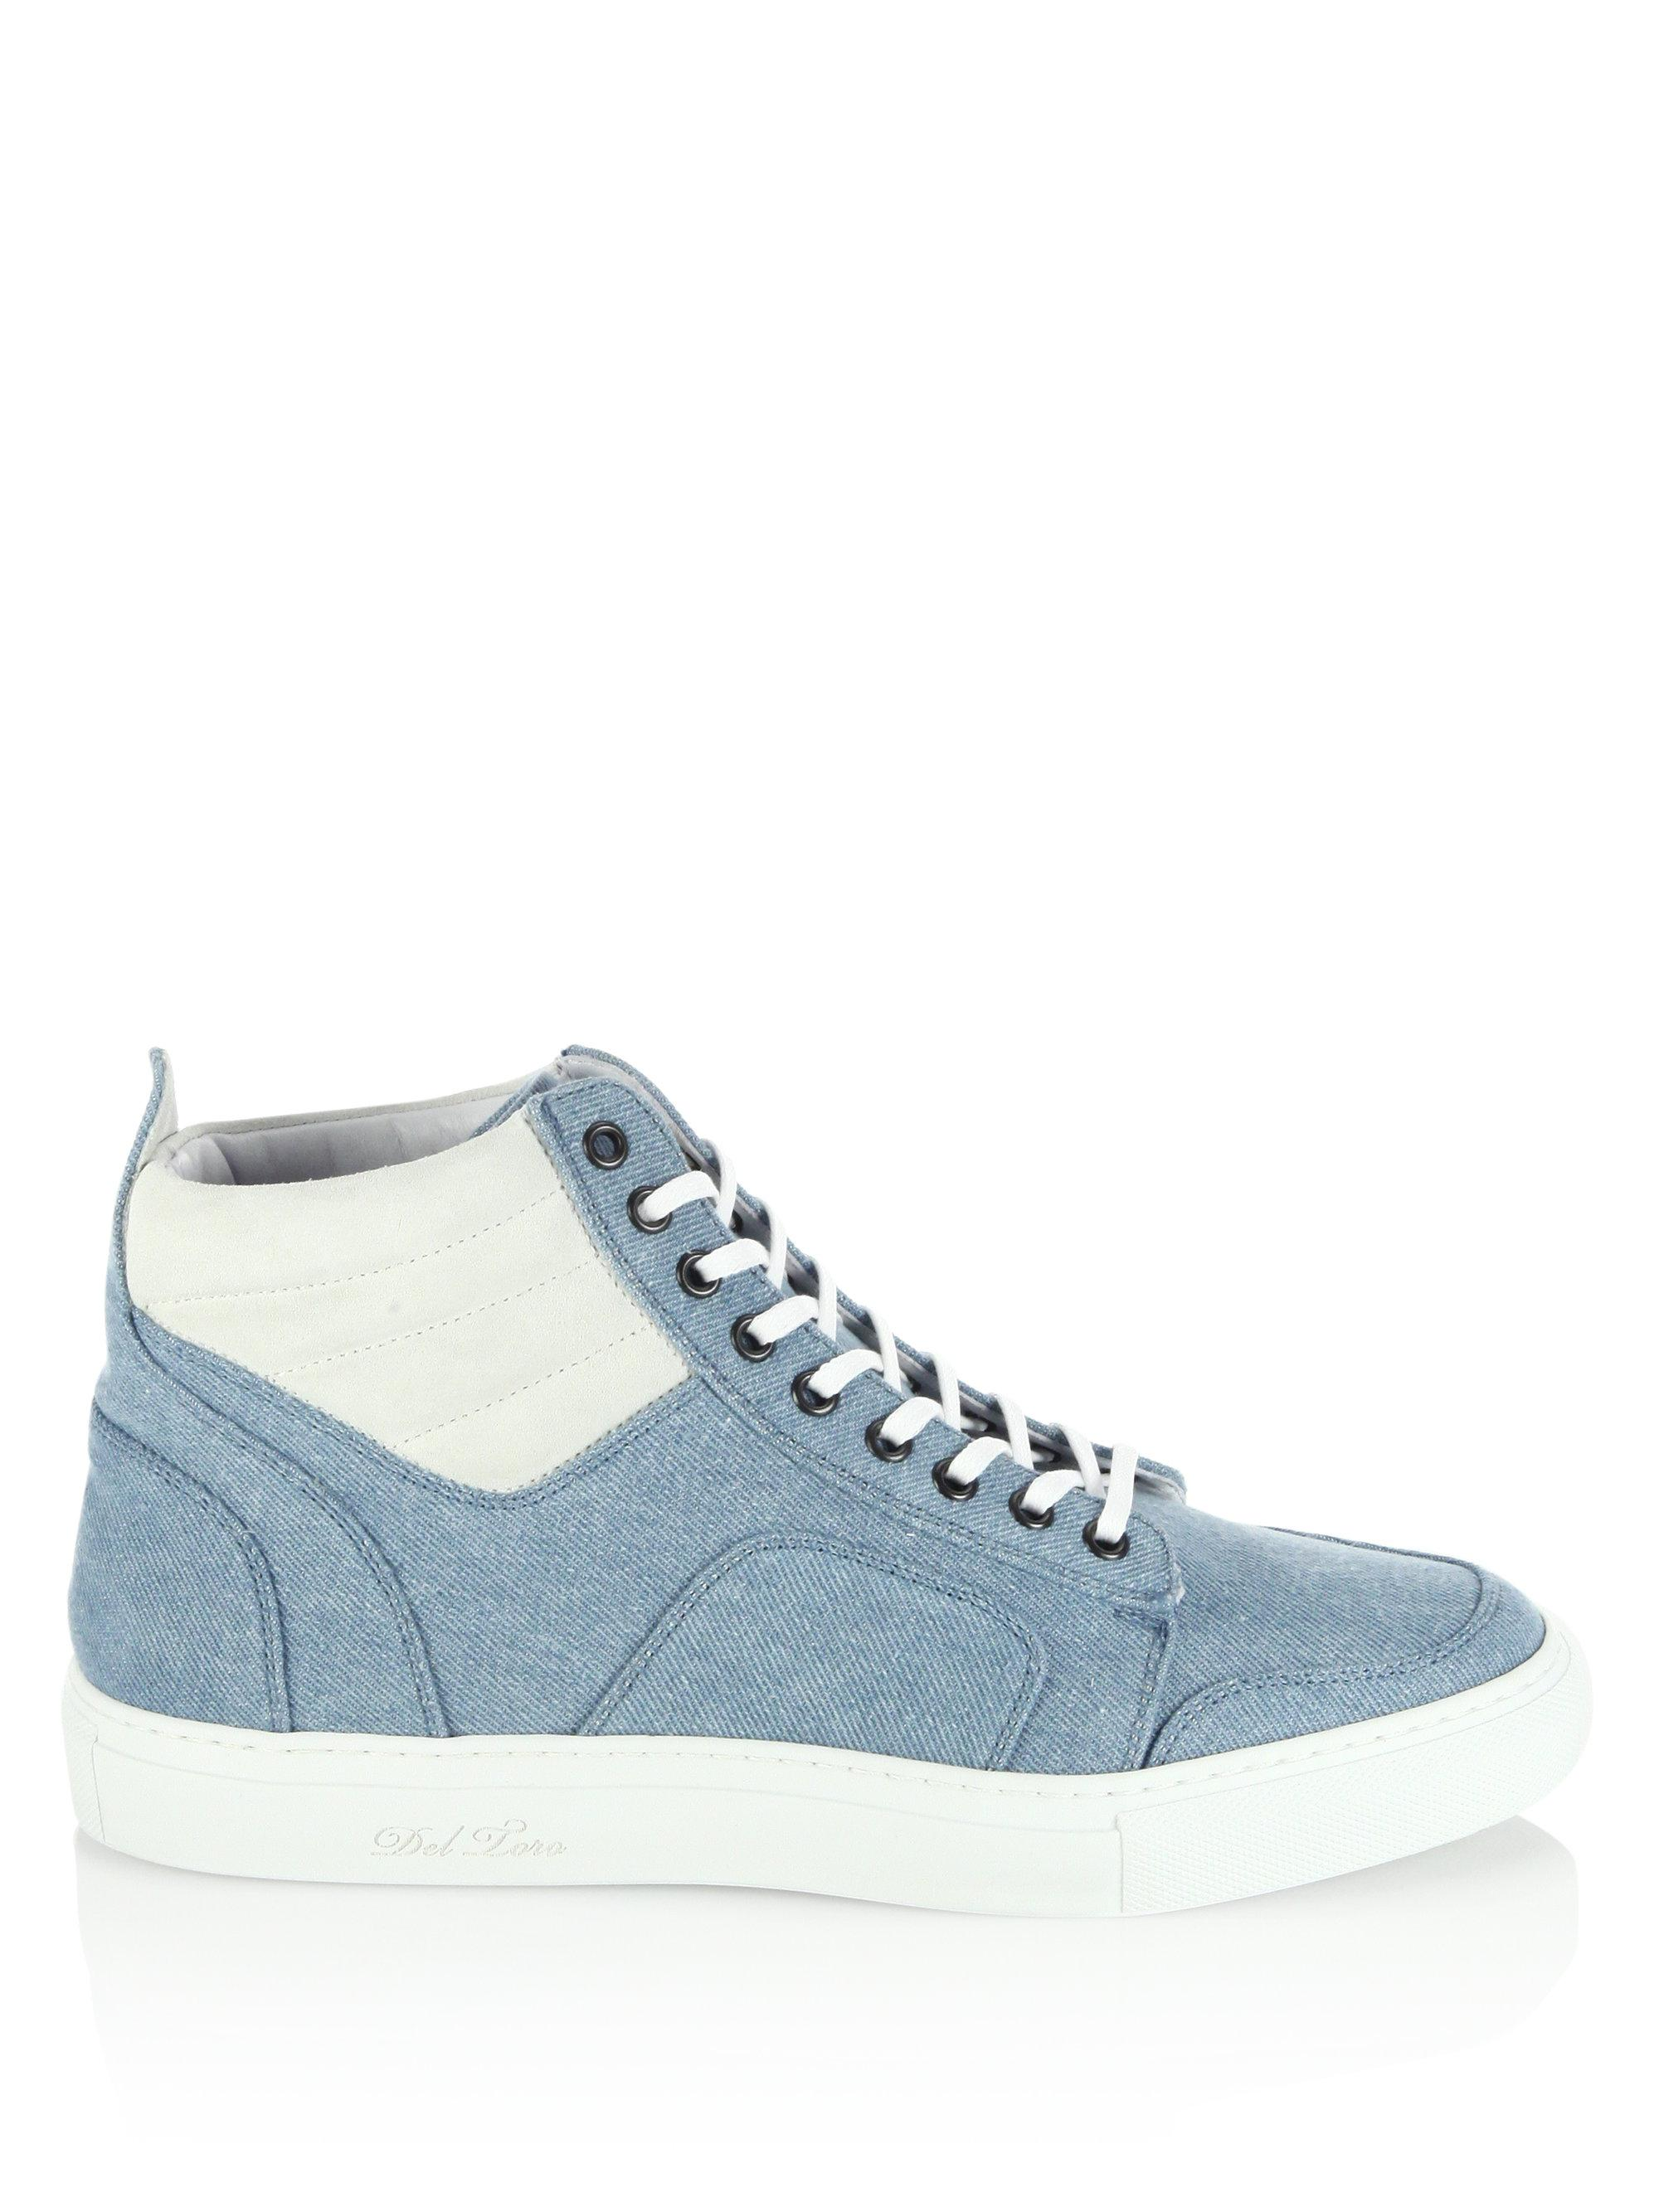 DEL TORO Two-Tone Boxing Sneakers